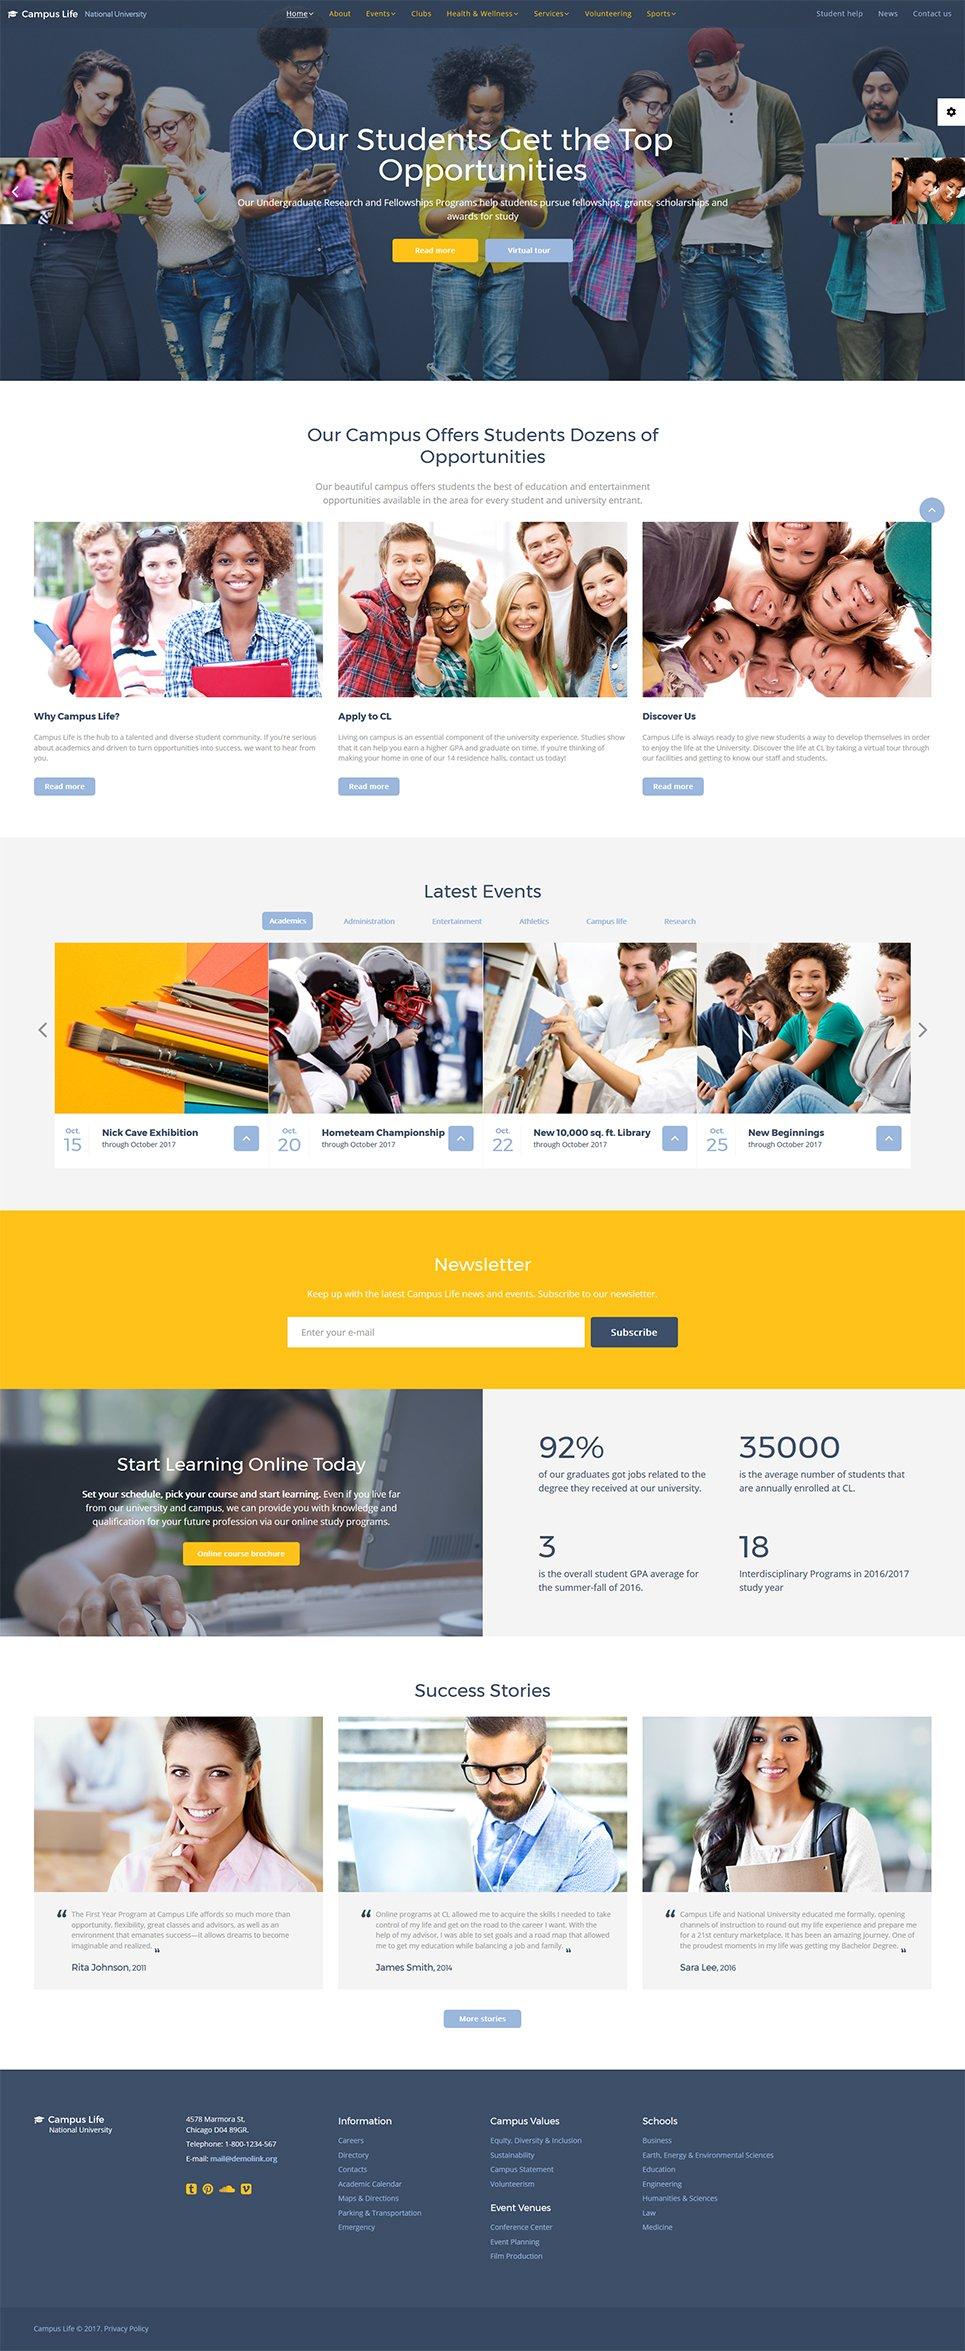 """Campus Life - National University Multipage"" modèle web adaptatif #61281"